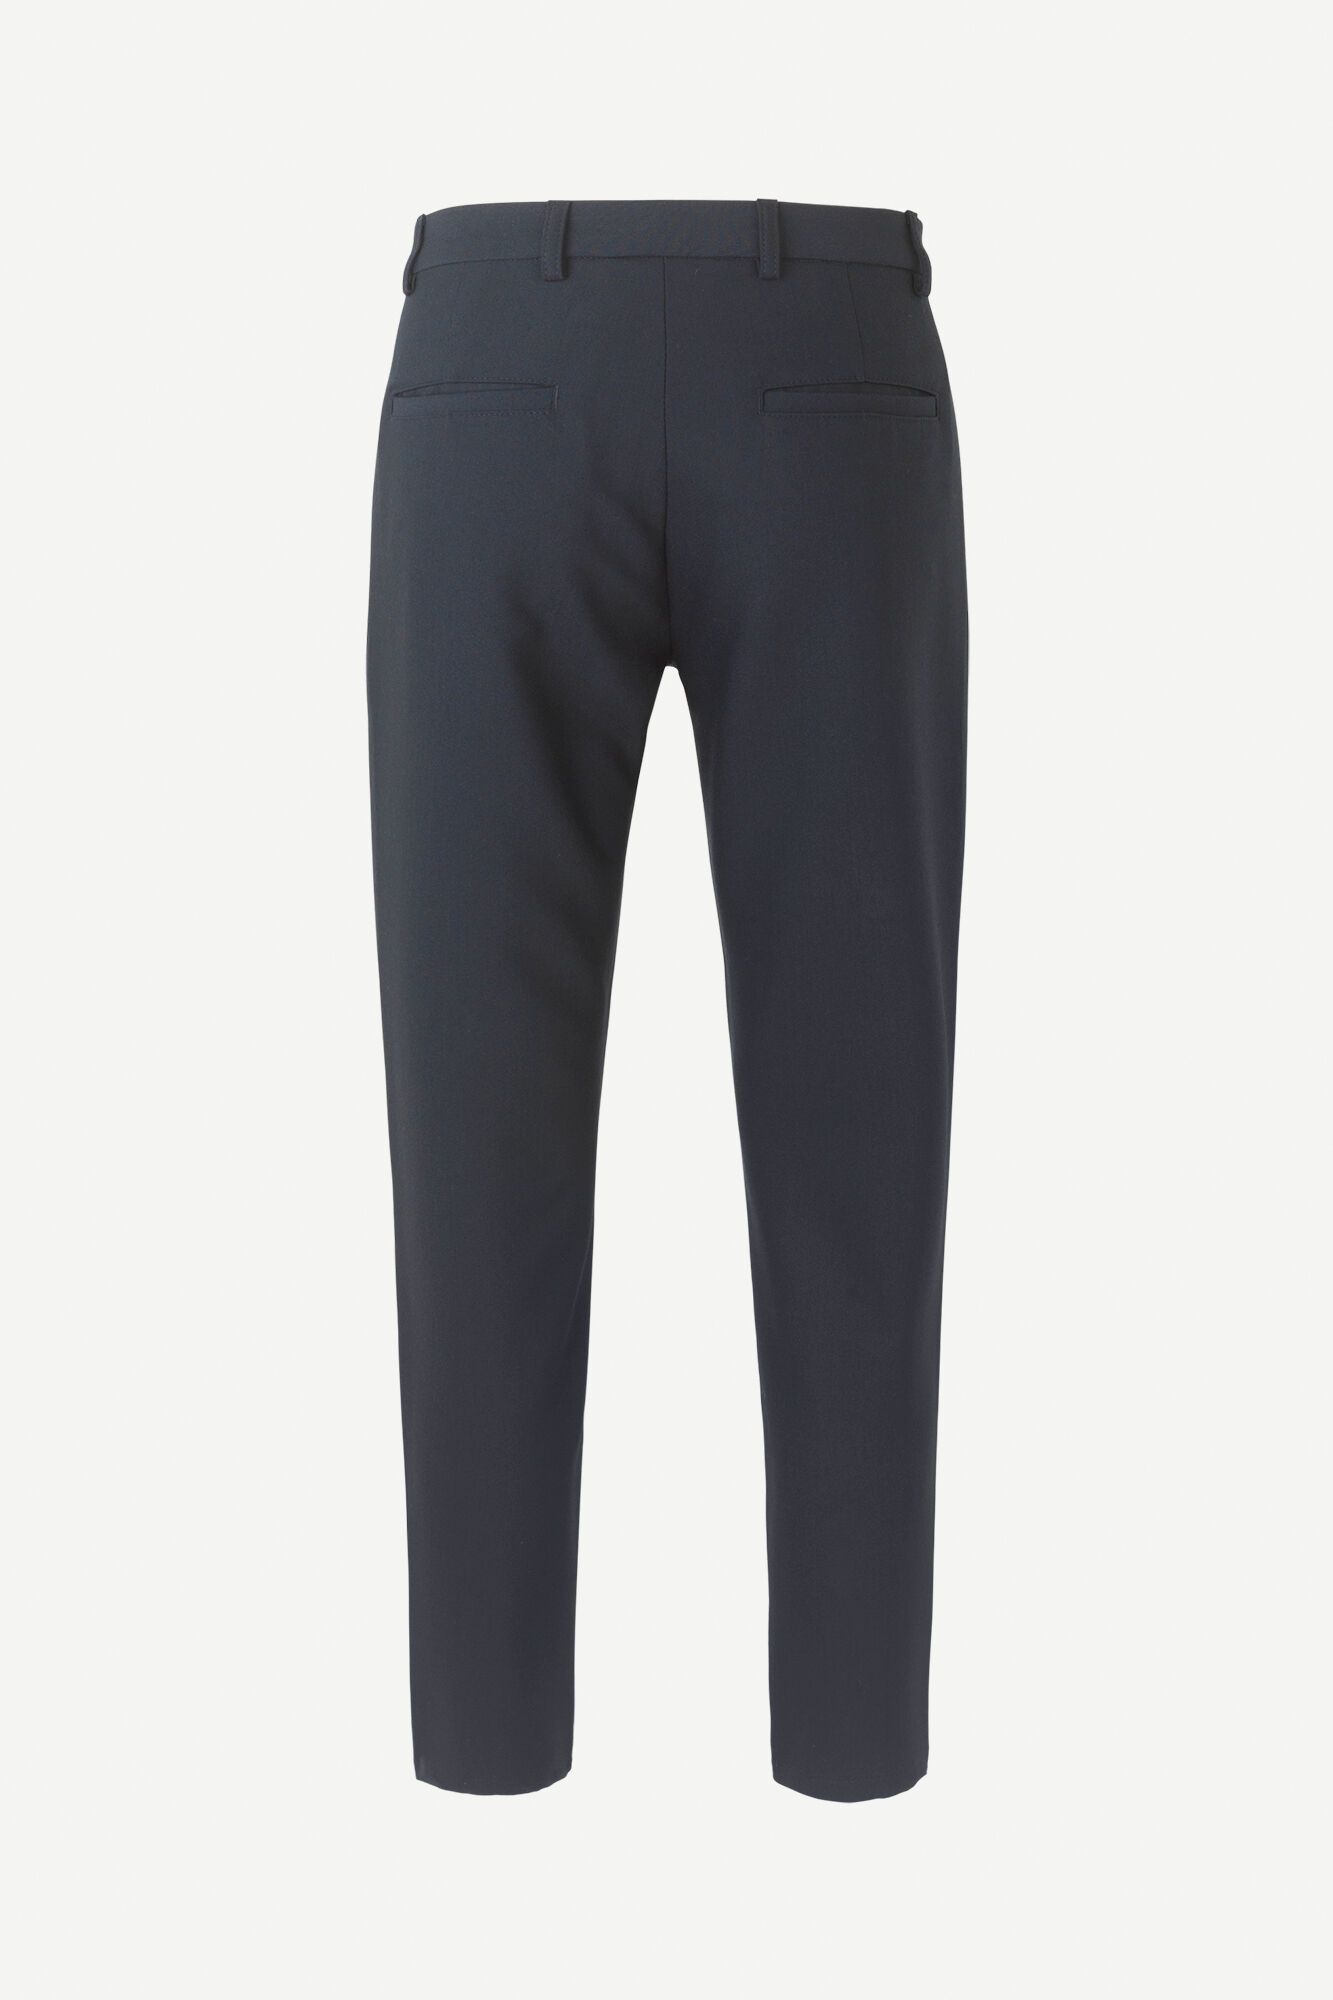 Samsøe & Samsøe Frankie bukser, dark sapphire, 33